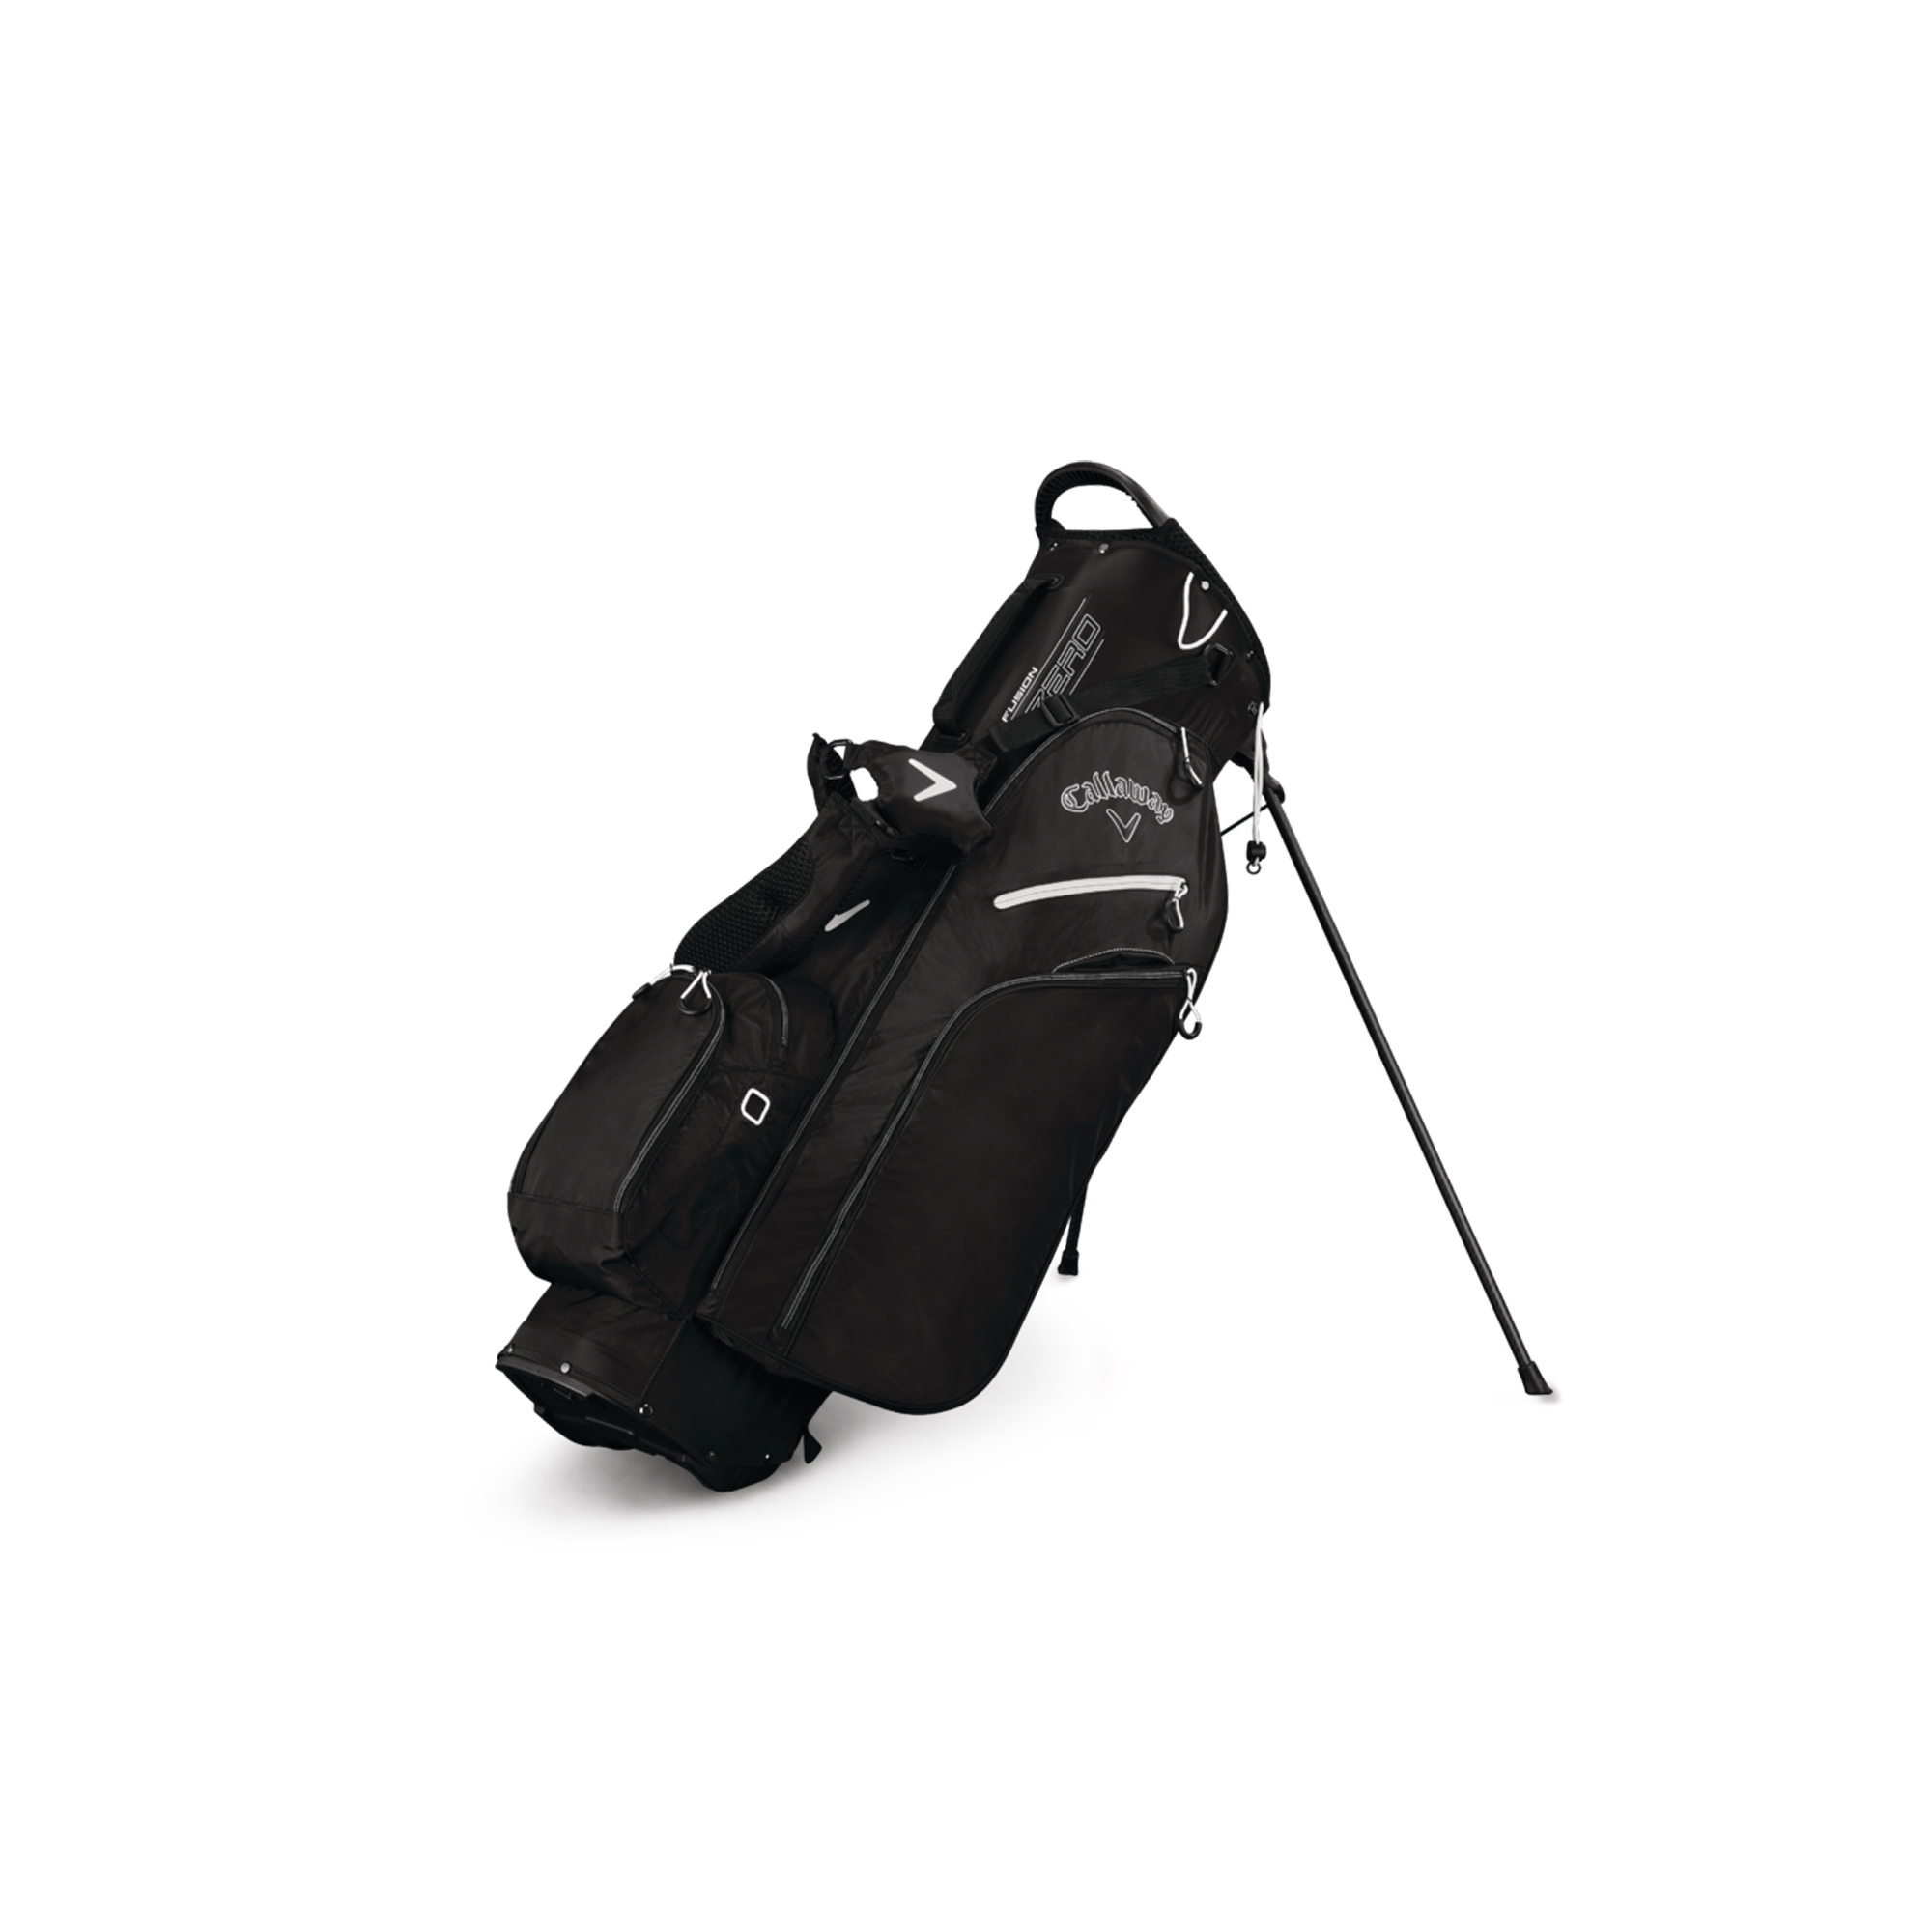 Callaway Fusion Zero Golf Stand Bag Black/Titanium/Wht